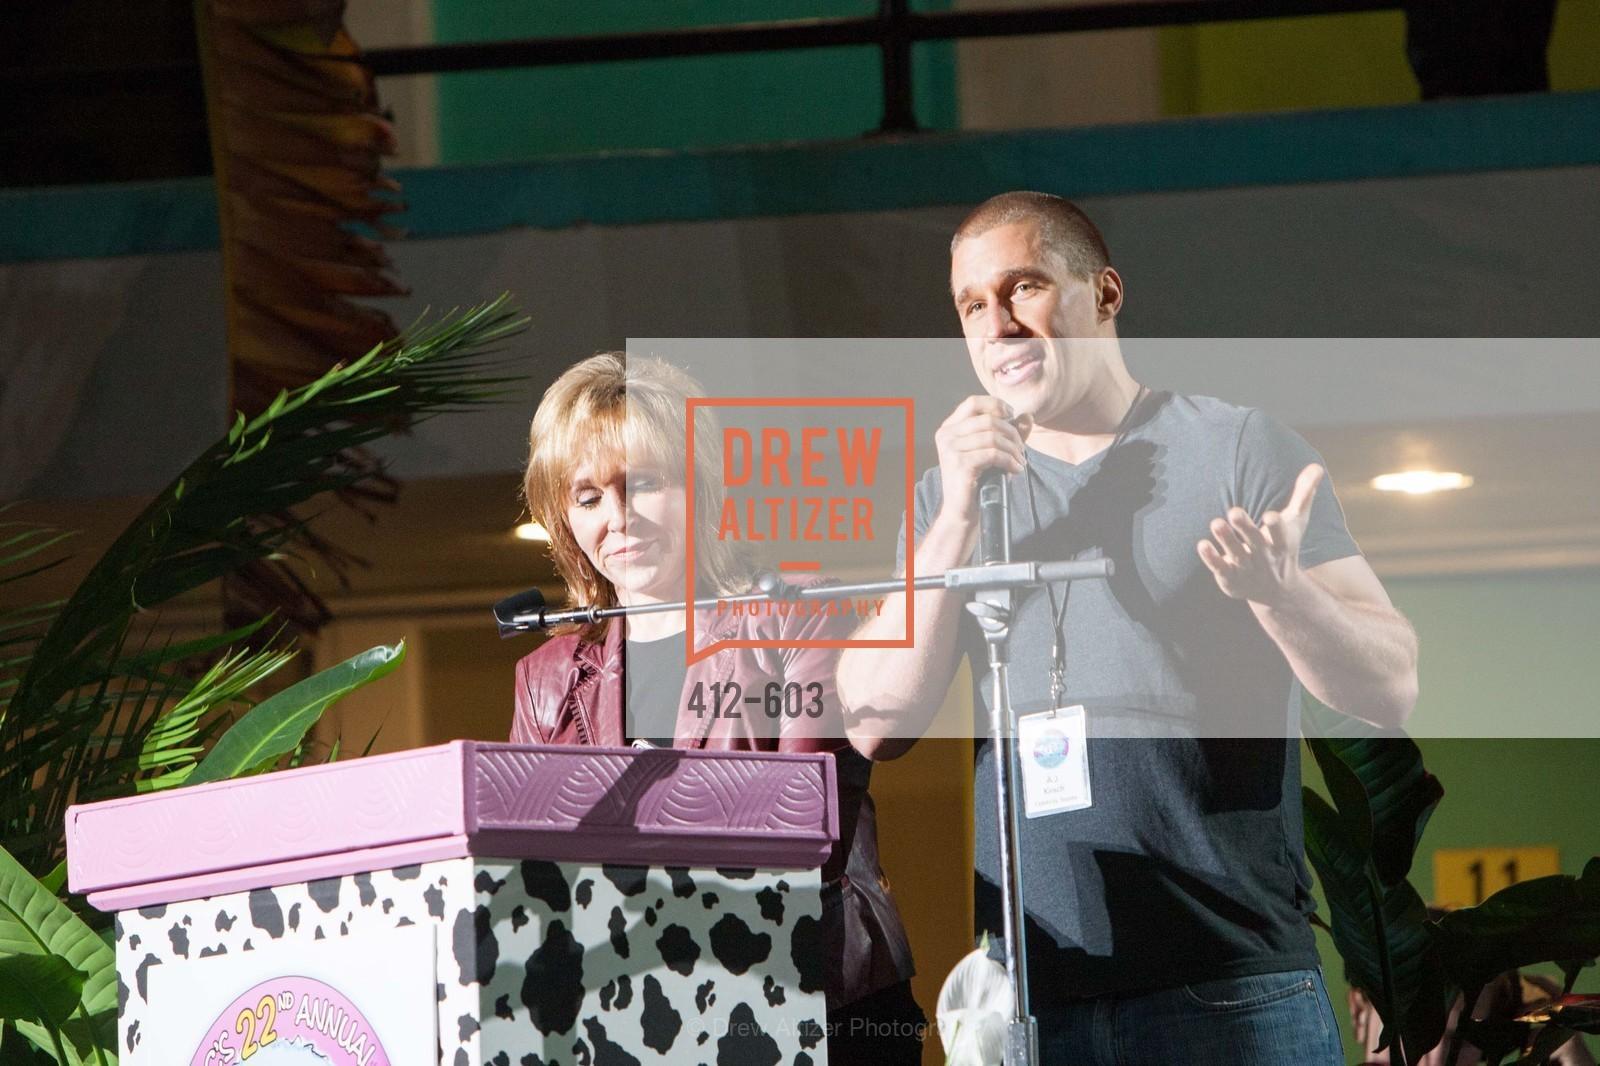 Cheryl Jennings, AJ Kirsch, 22nd Annual TNDC CELEBRITY POOL TOSS, US, October 9th, 2014